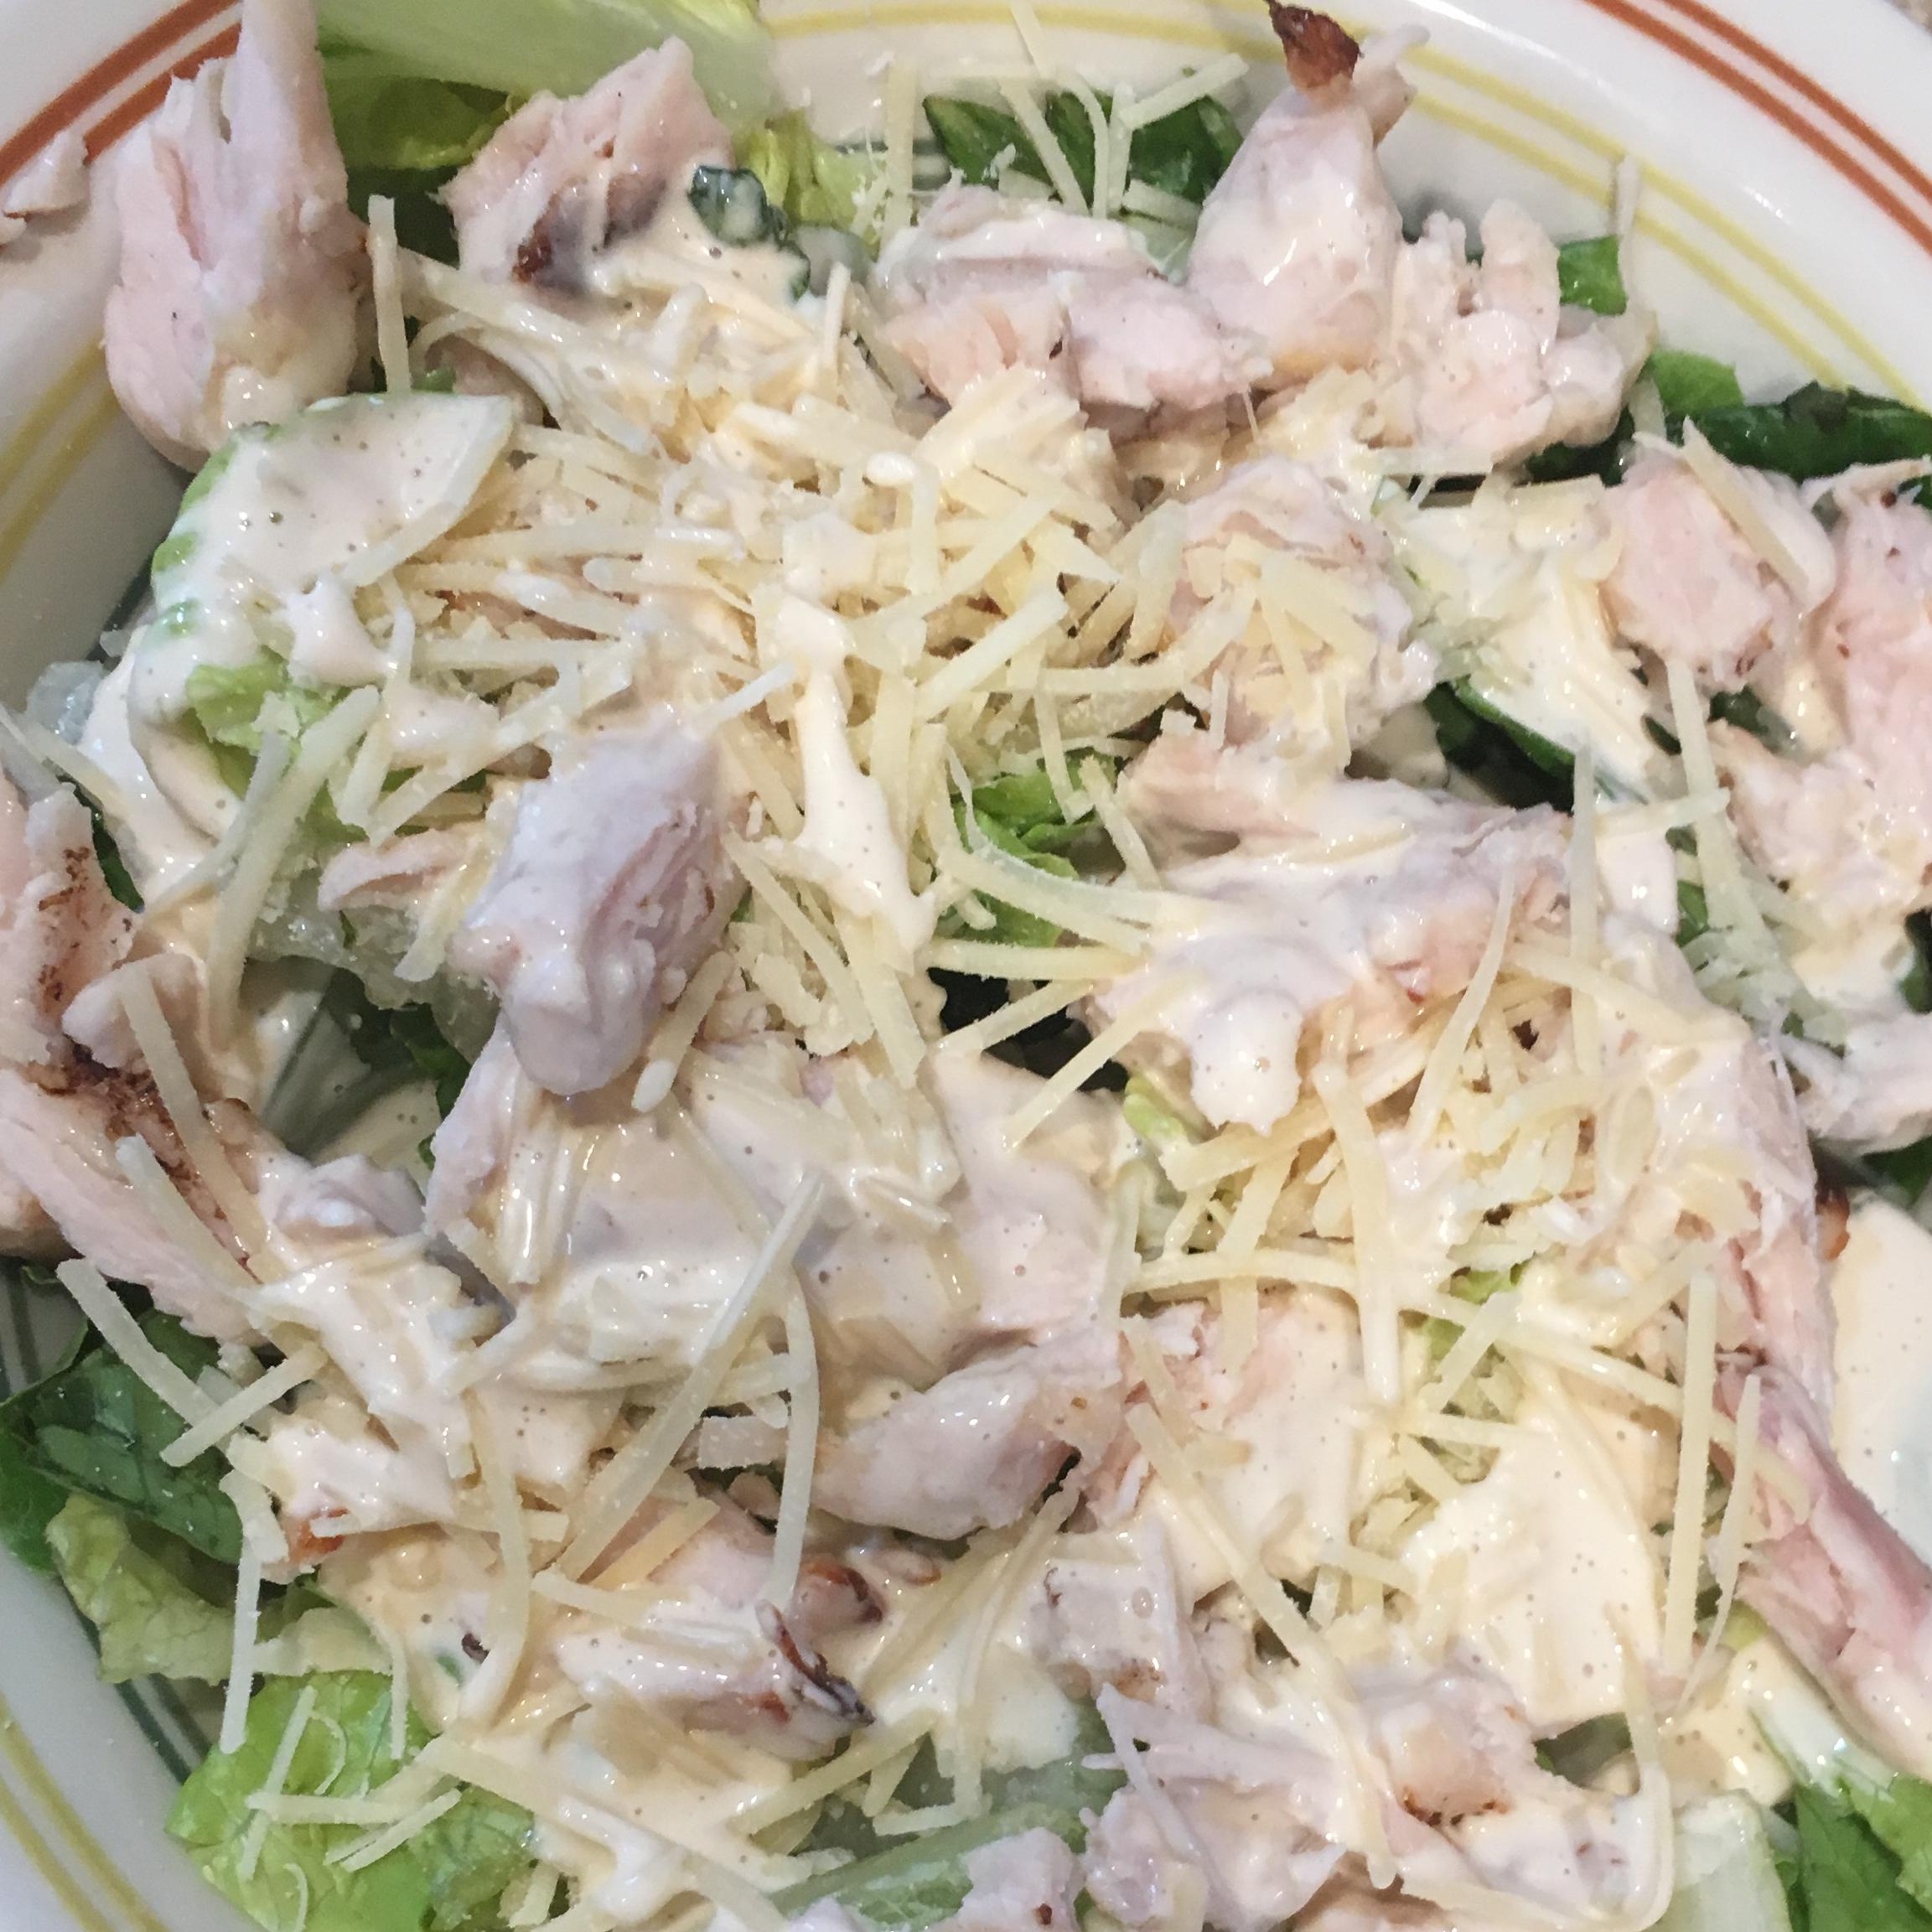 Pork Caesar Salad from Smithfield(R)